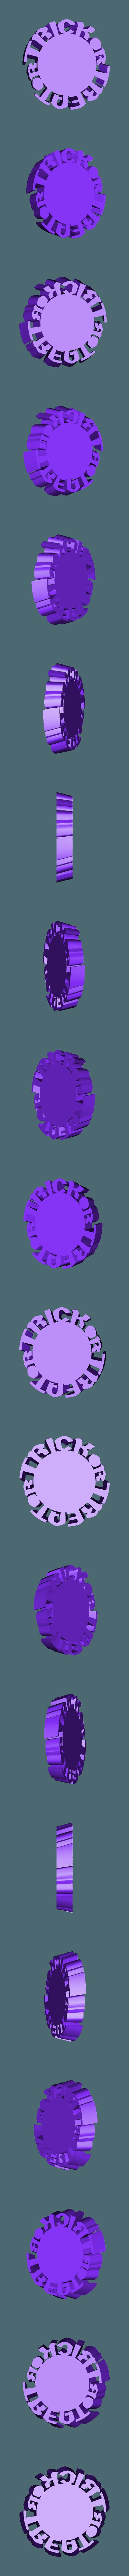 trickortreat_bowl.stl Download free STL file Trick or Treat or Bowl • 3D printable model, tone001